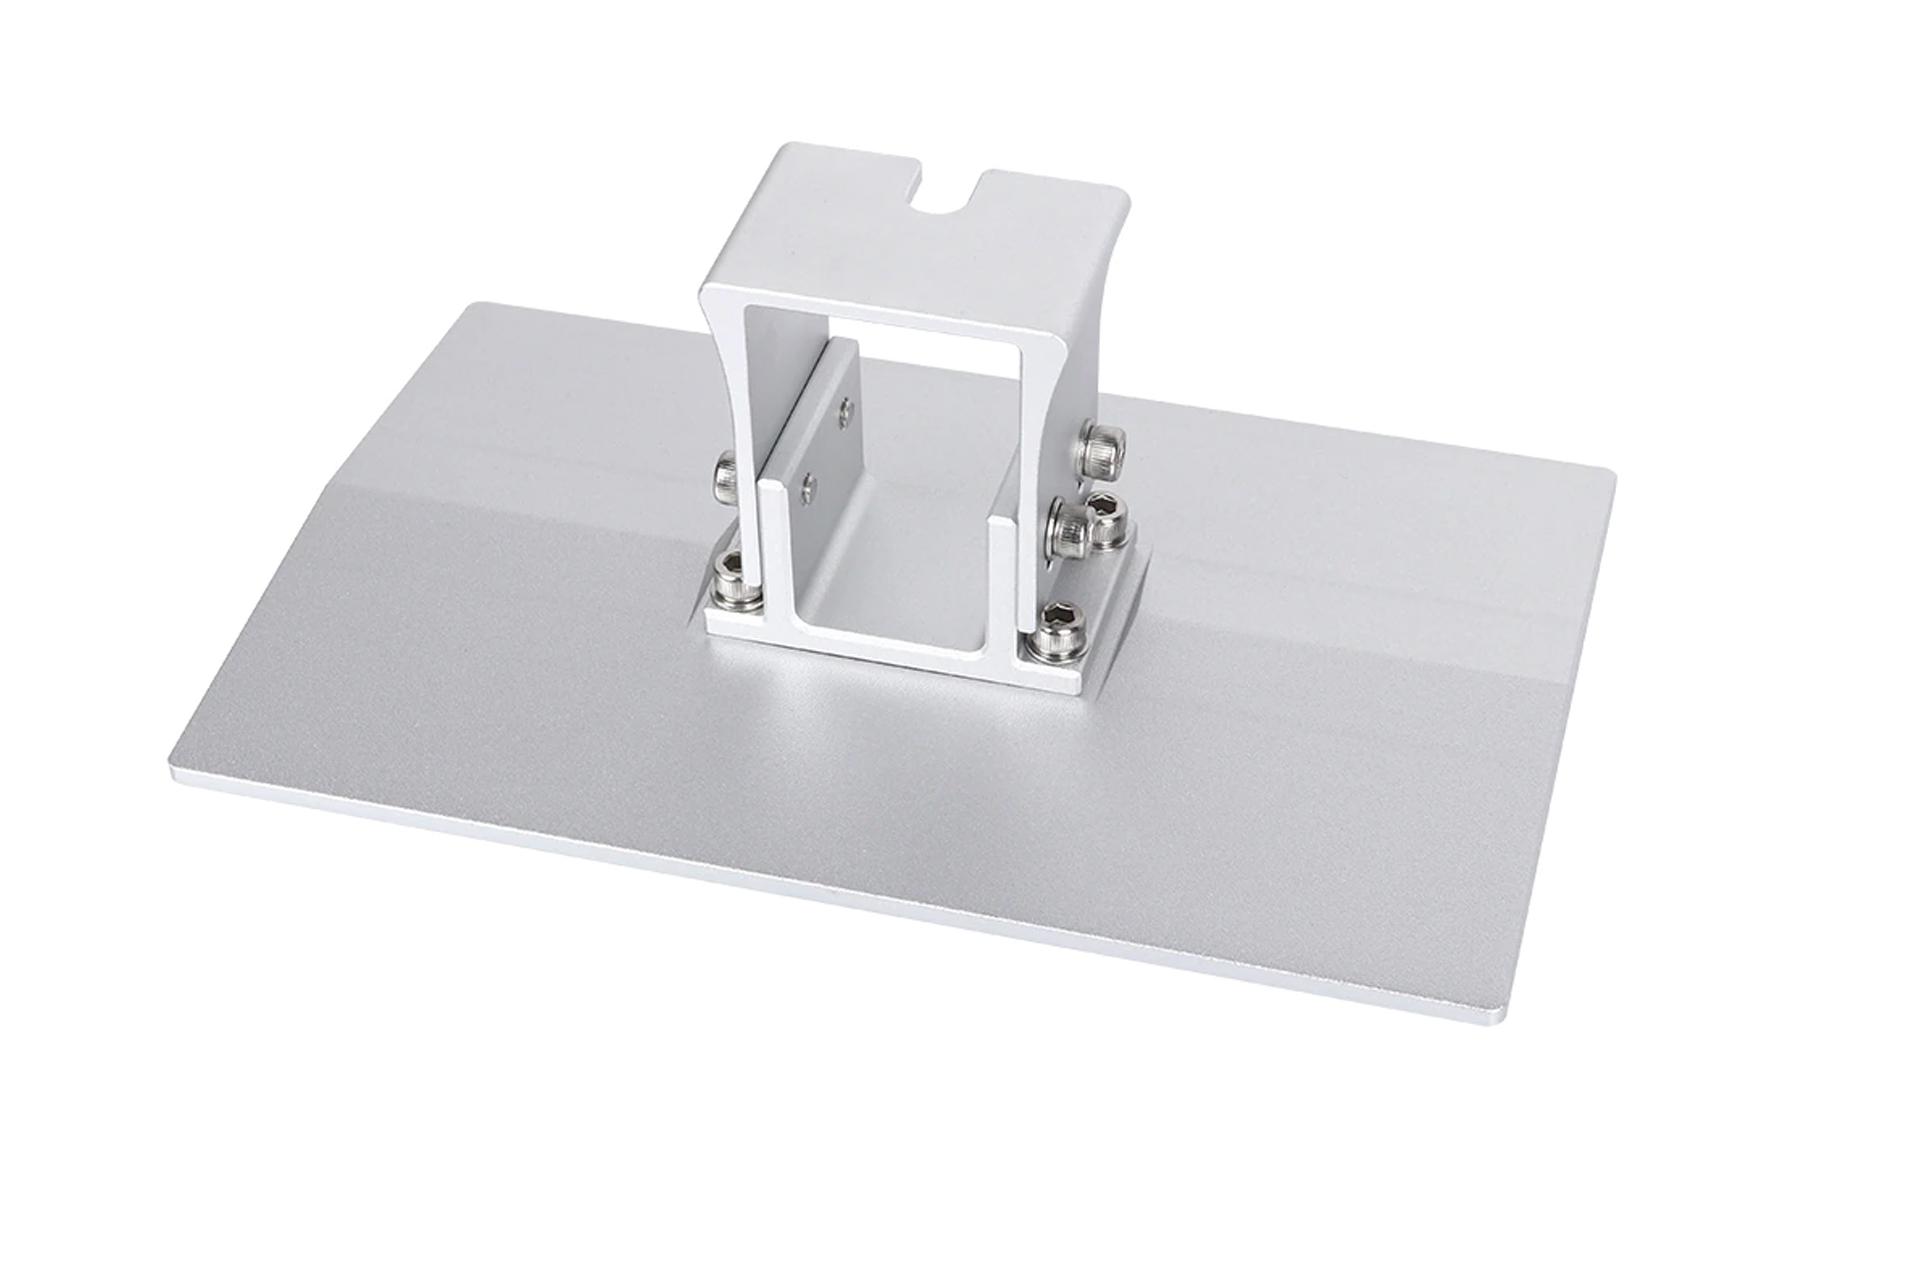 Платформа для печати для 3D принтера Anycubic Photon Mono X купить украина 1